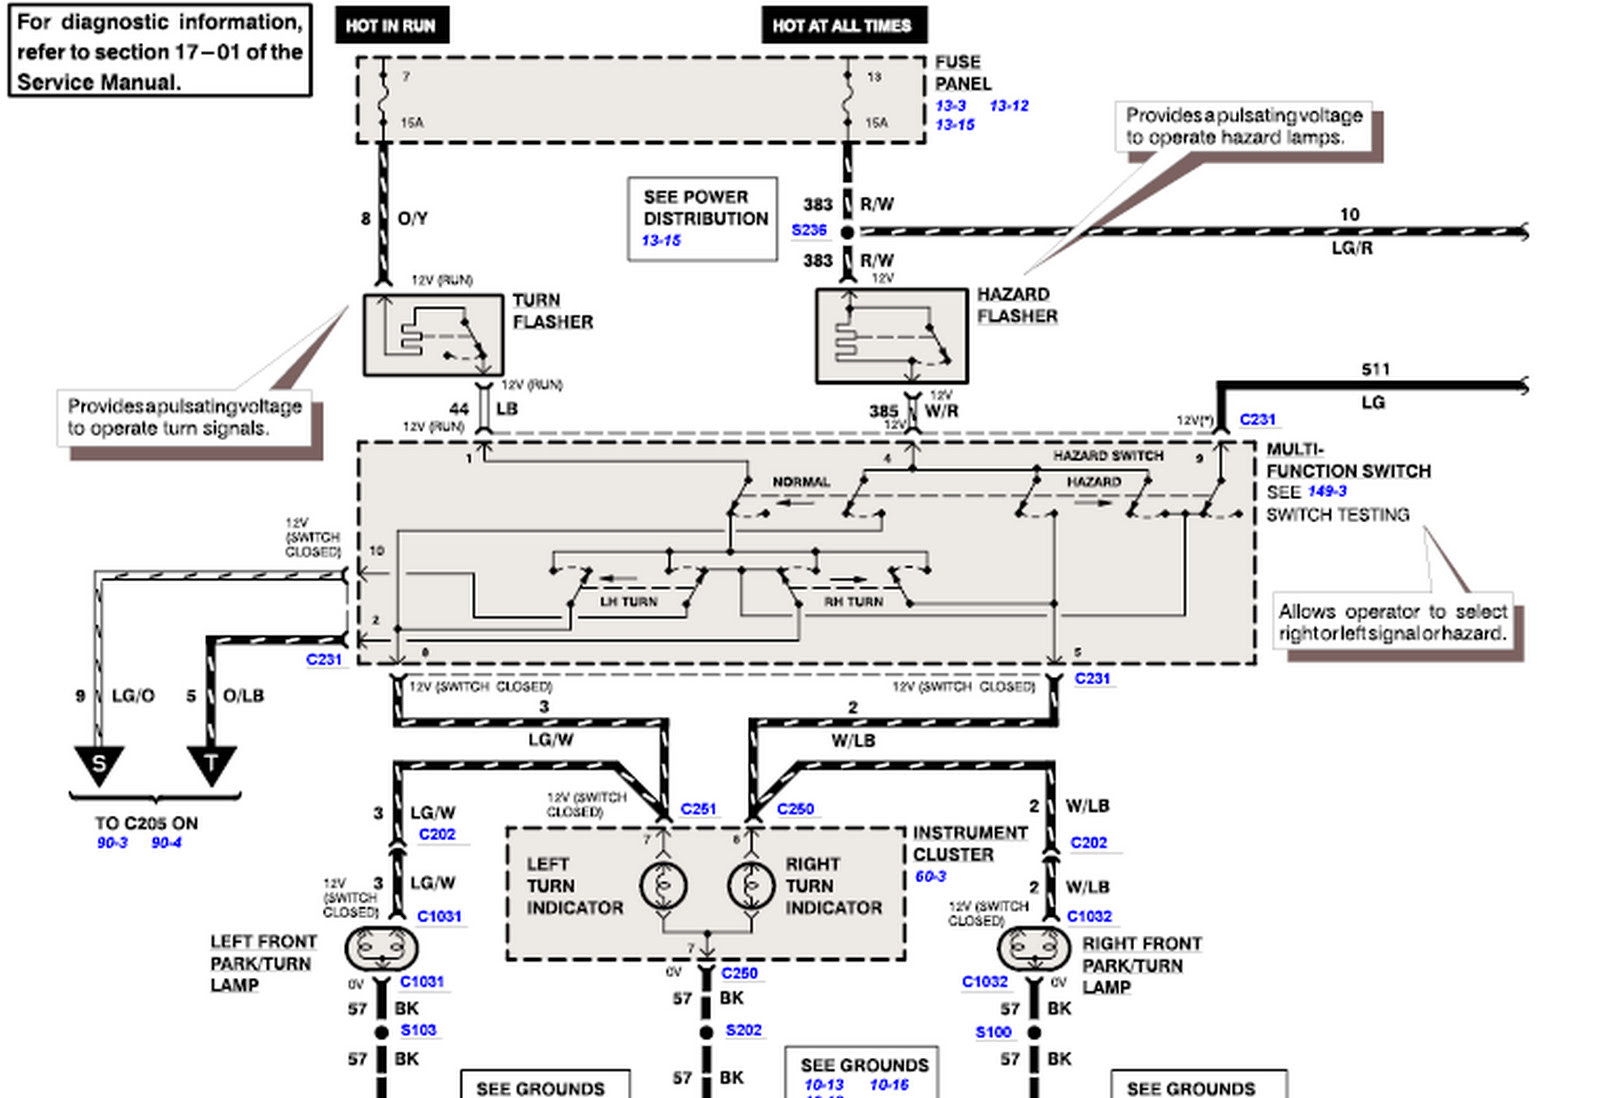 2011 F250 Trailer Wiring Diagram For Lights 4 Prong Dryer Plug Wiring Diagram Dvi D Yenpancane Jeanjaures37 Fr